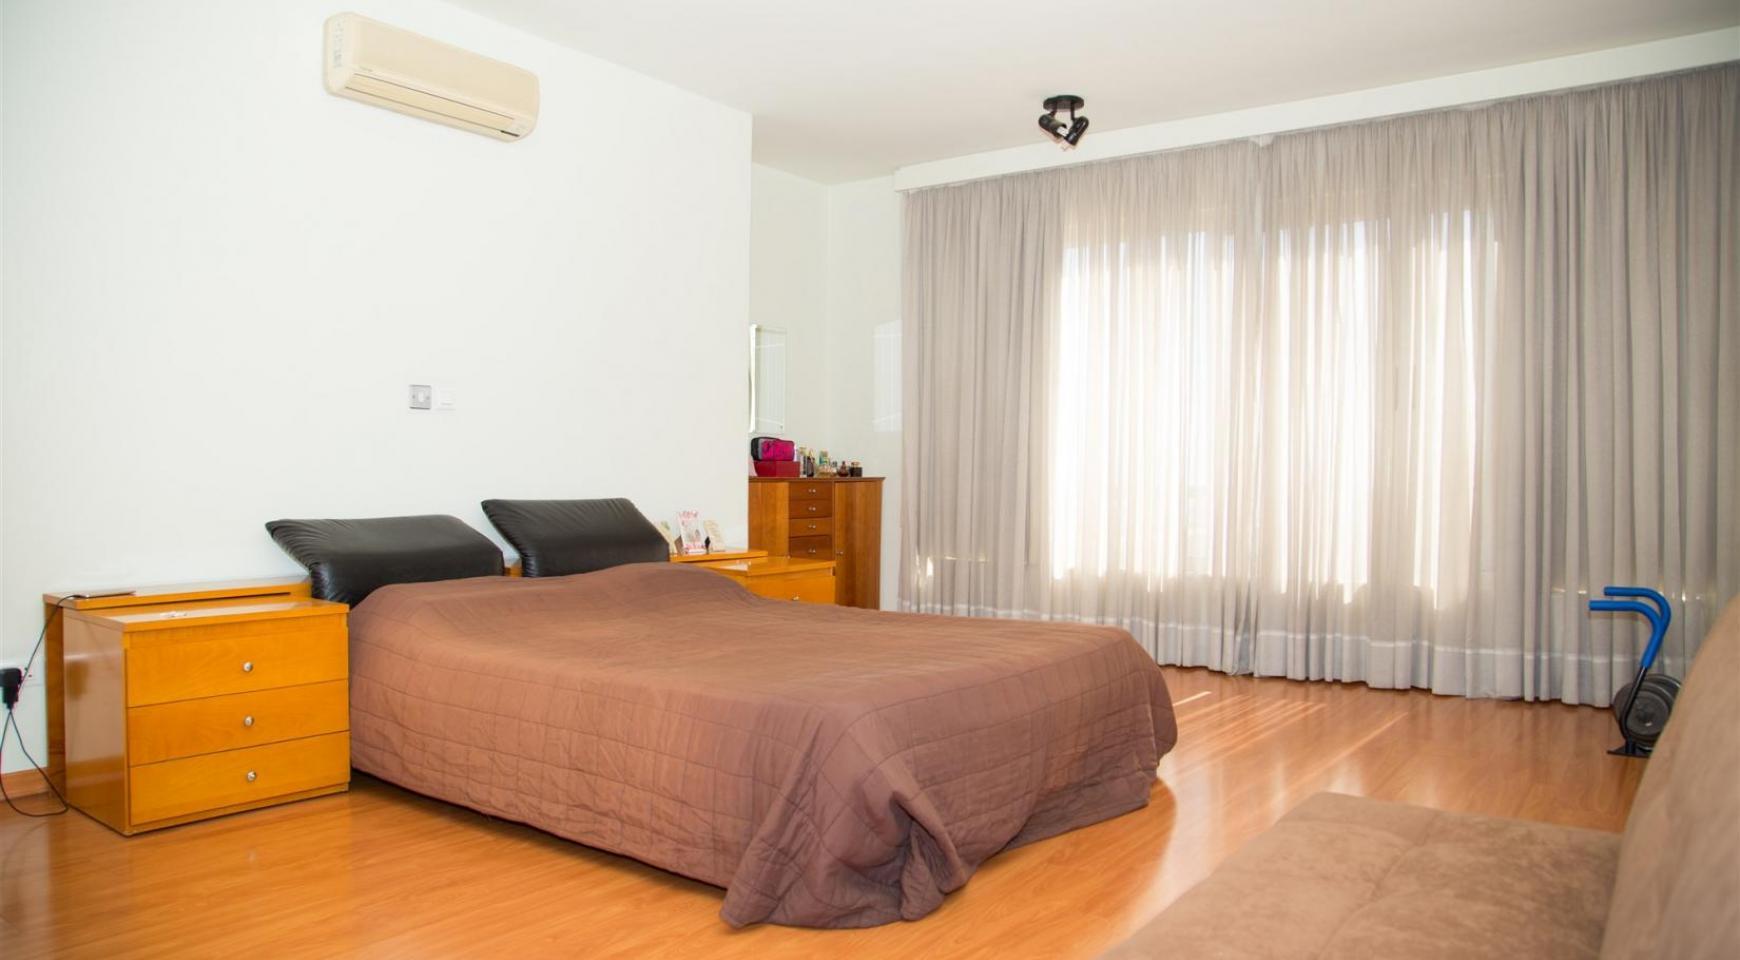 Modern Luxury 4 Bedroom Villa in Sfalagiotisa, Agios Athanasios - 29